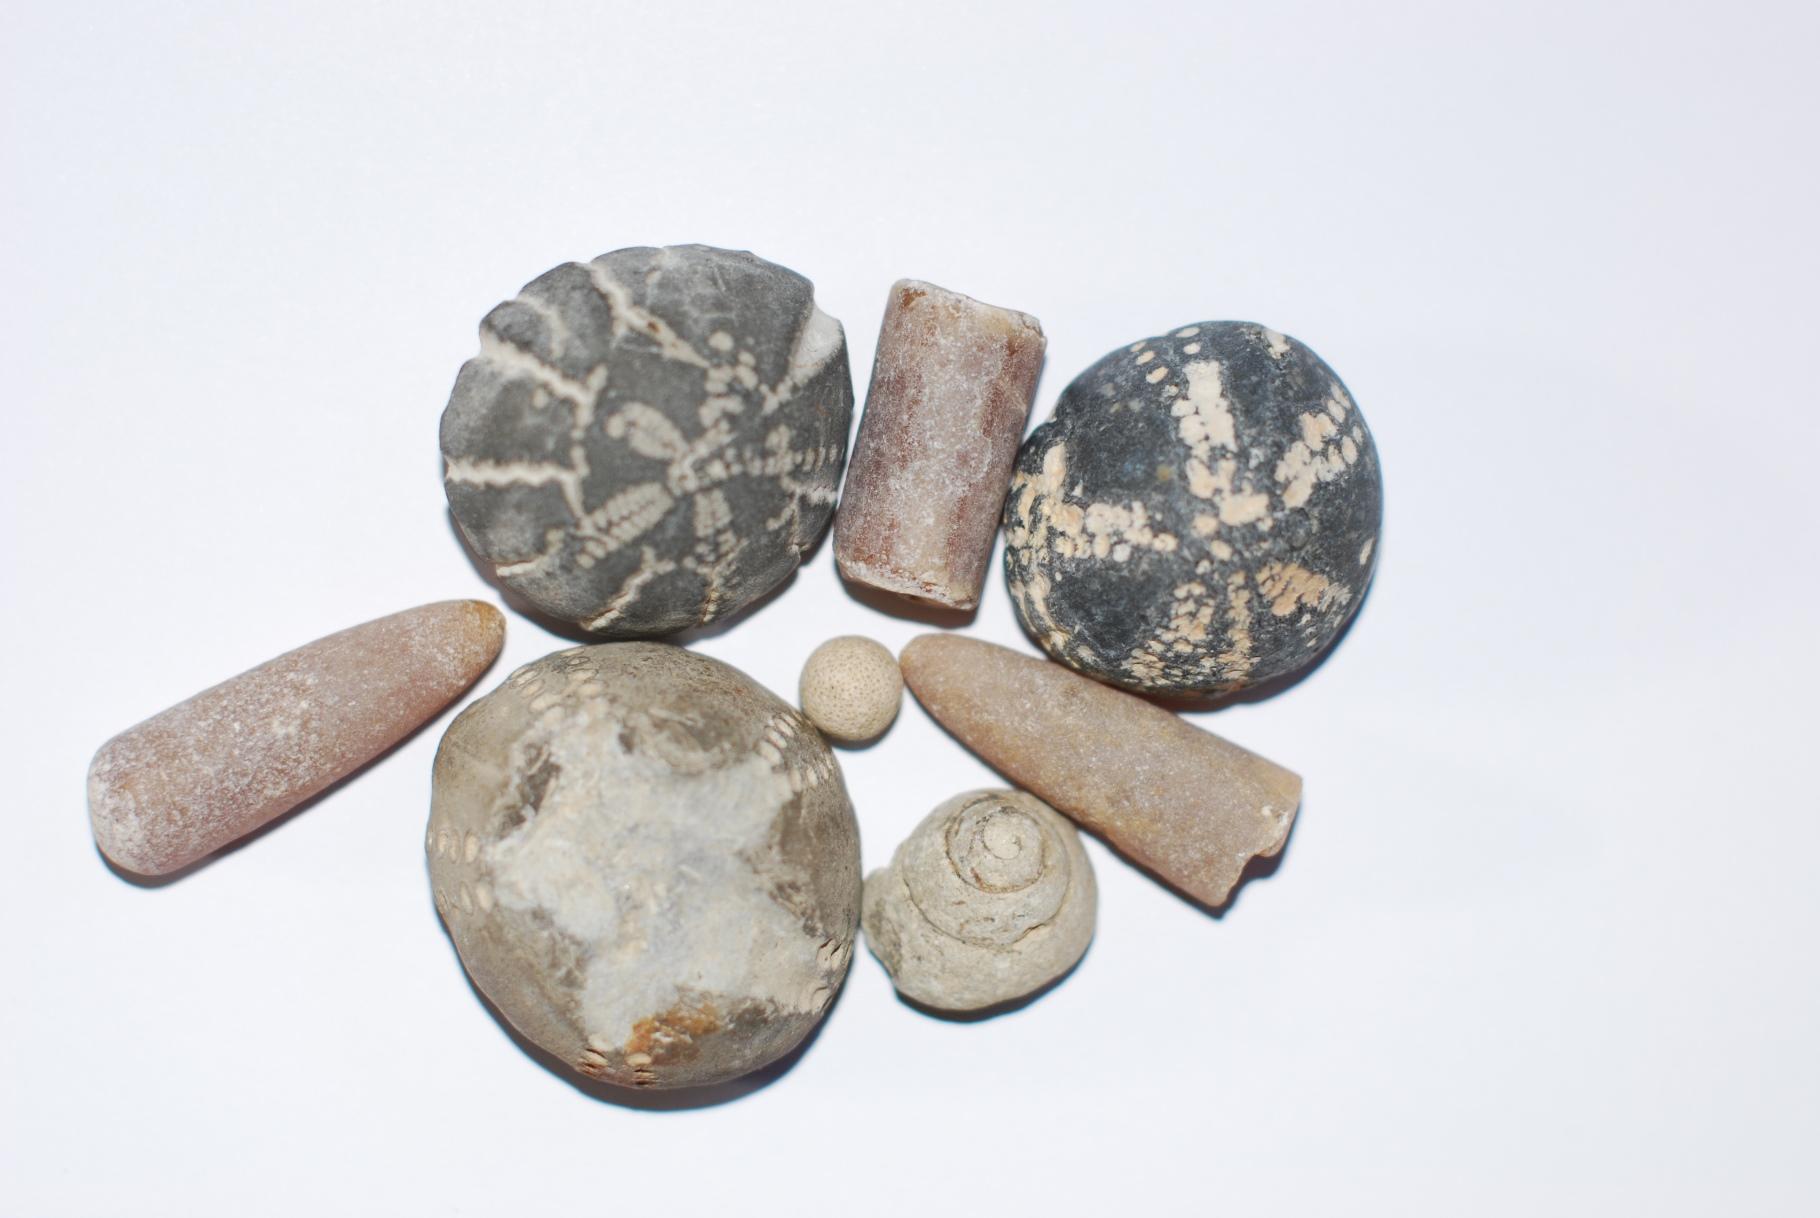 Foto Sonja Fuhrmann Kiesgrubenschätze! – Fossilien sammeln